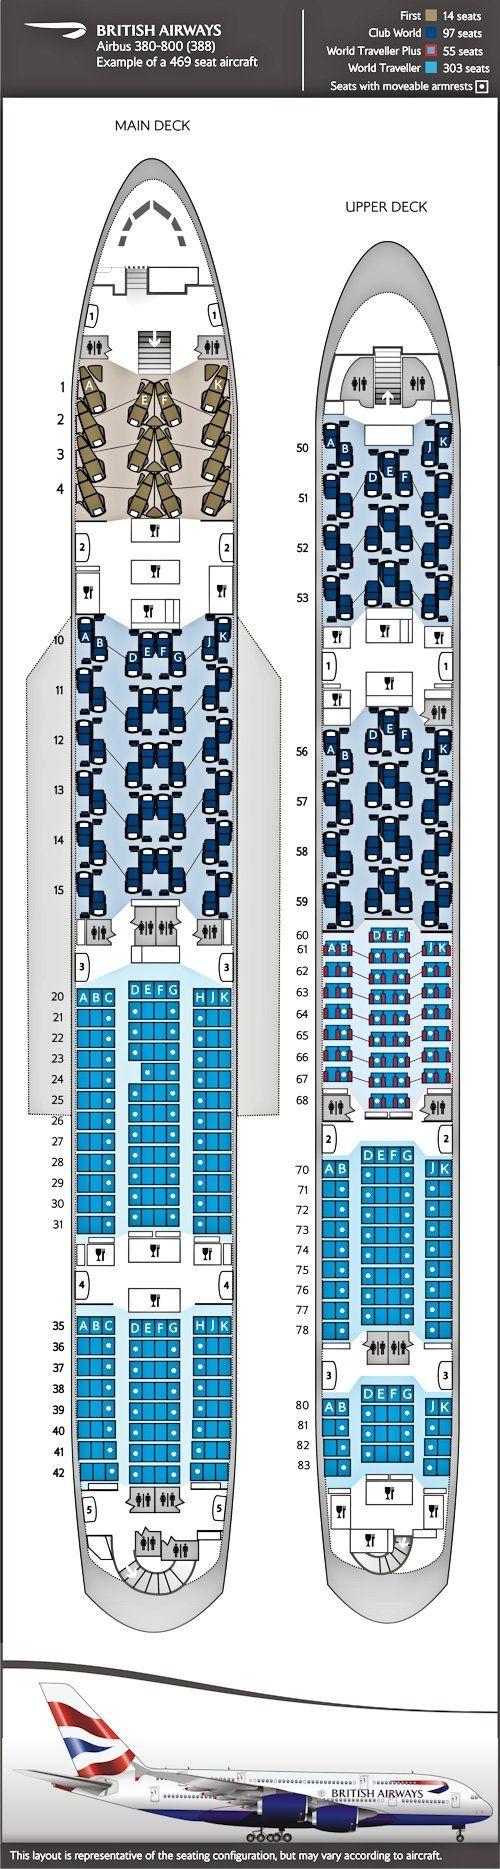 Airbus A380: British Airways, G-XLEA seating configuration.